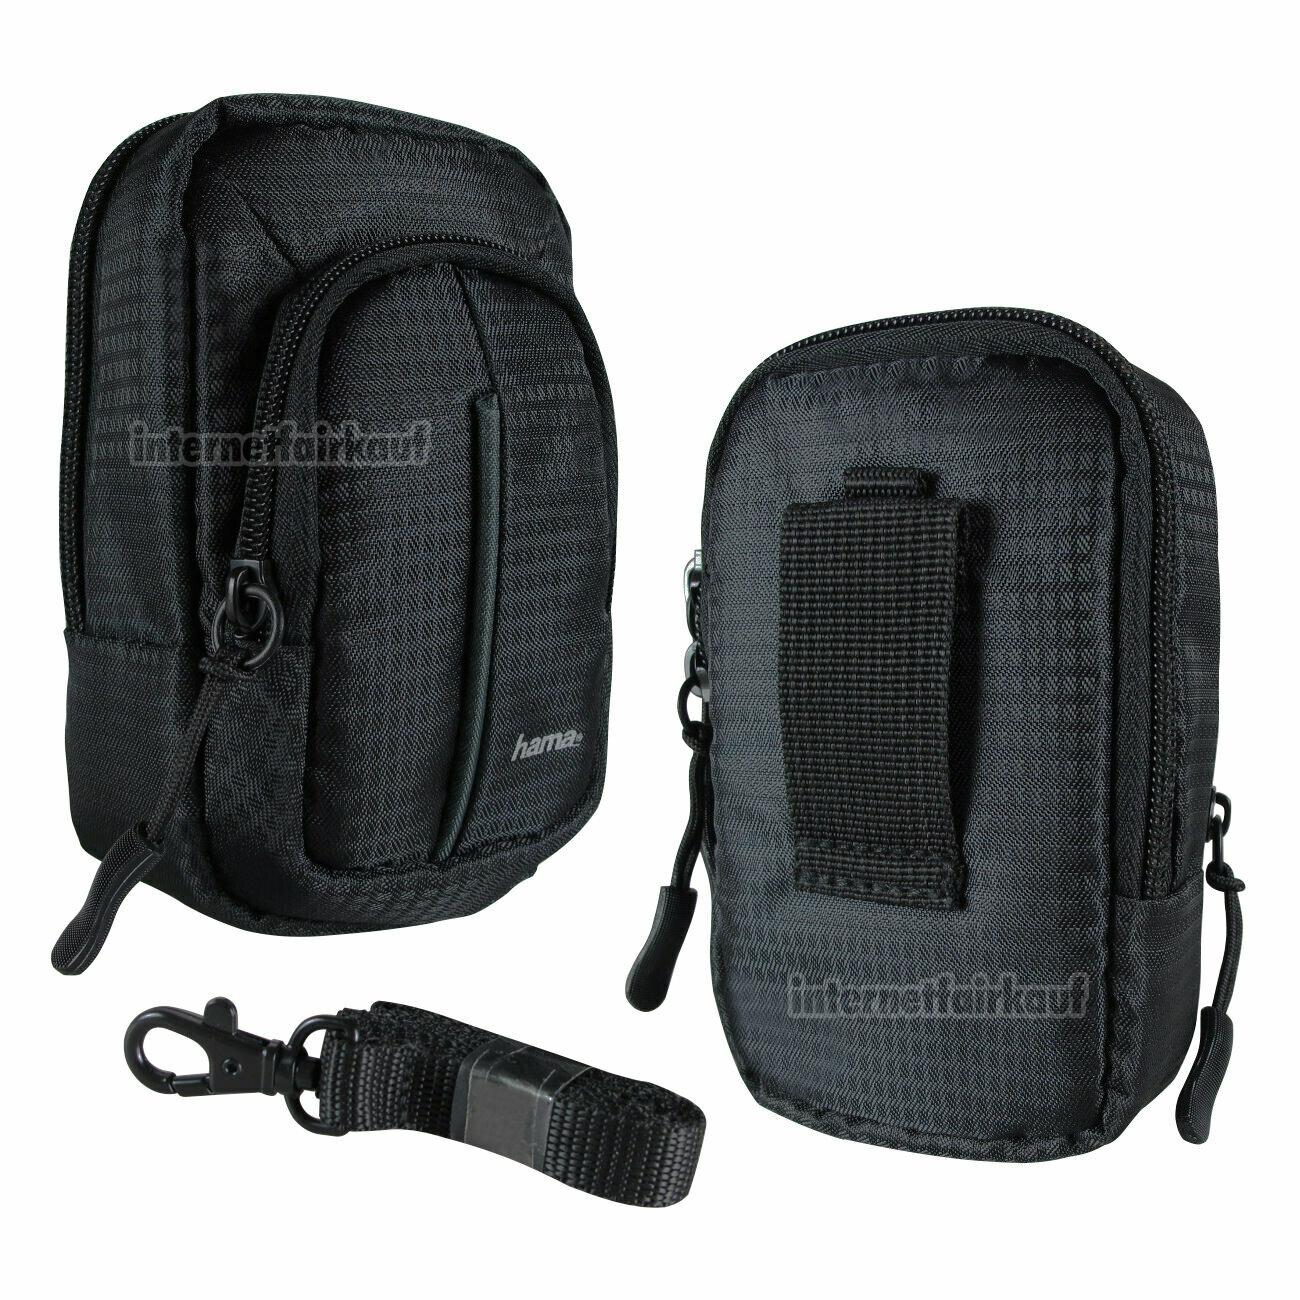 Fototasche Hama Kameratasche passend für Panasonic Lumix DMC-TZ96 TZ202